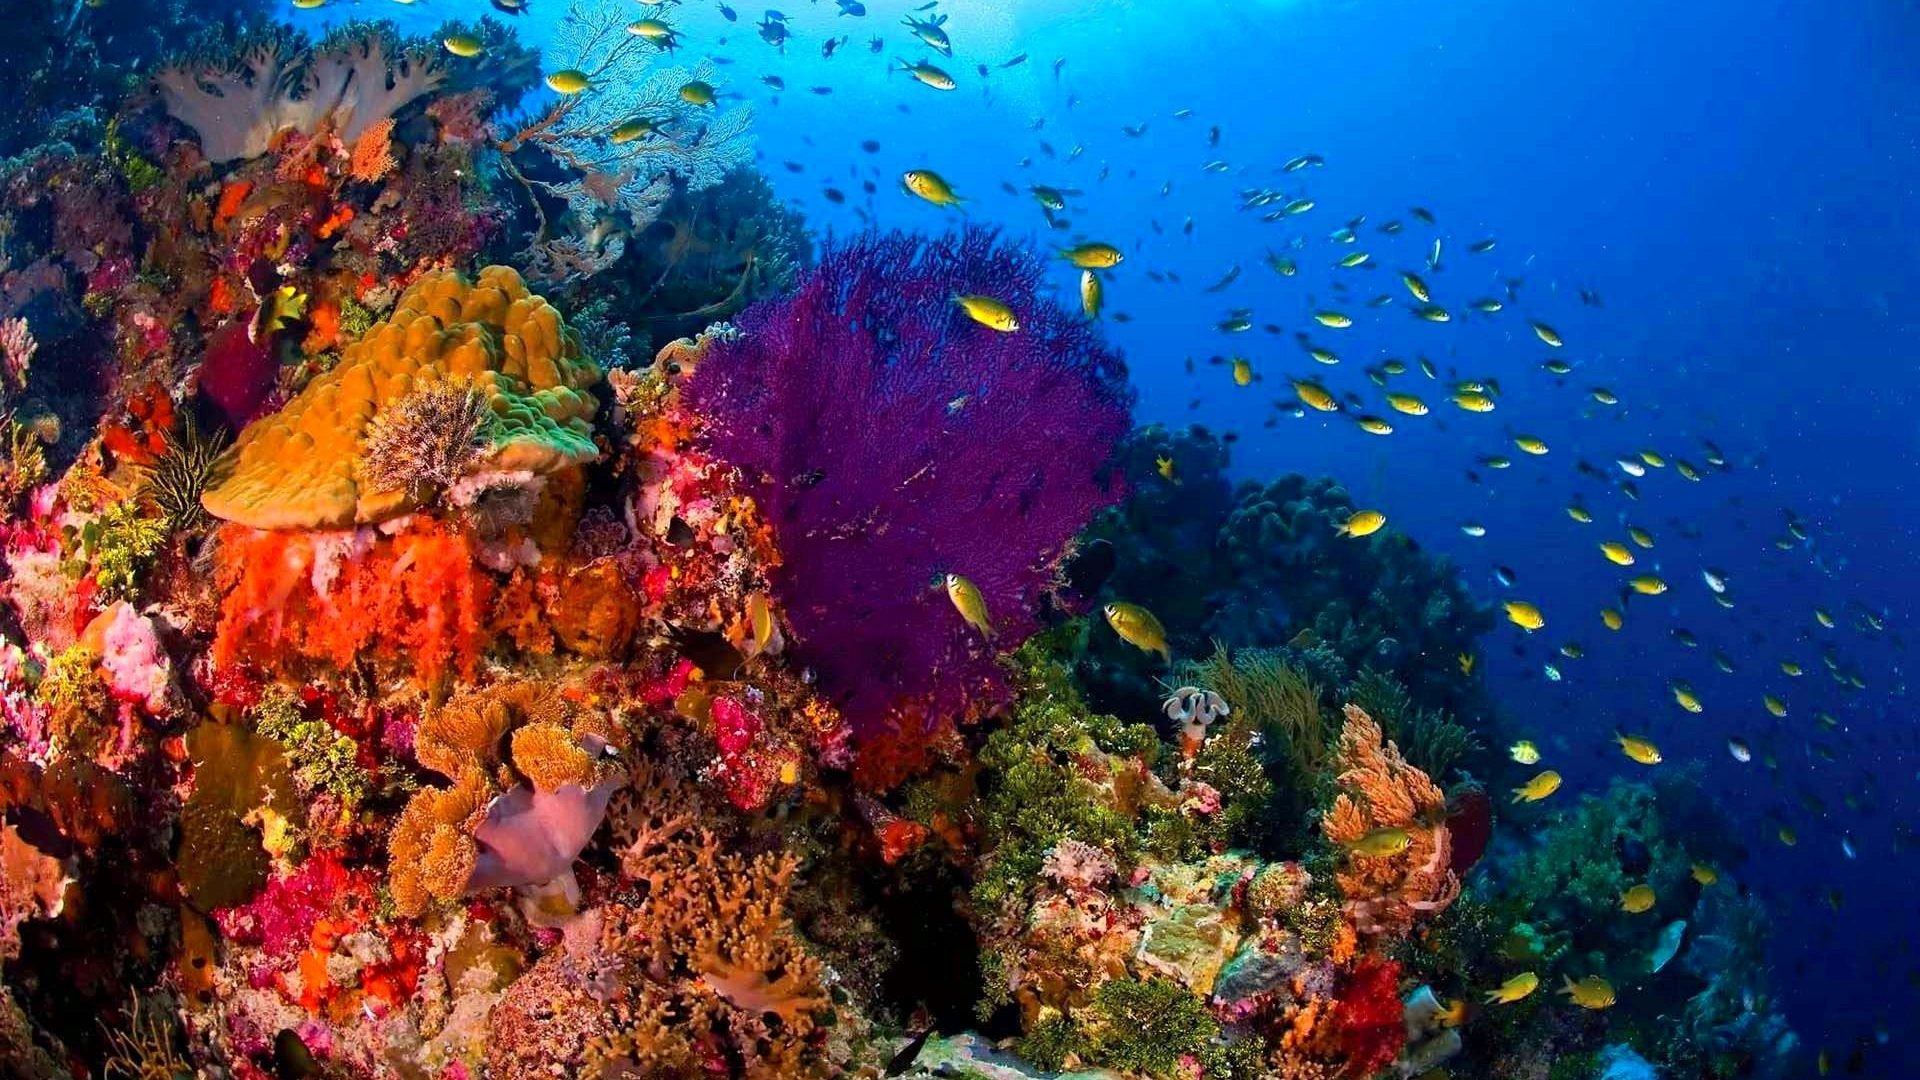 Fishes Sealife Sea Ocean Fish Nature Underwater Live Wallpaper